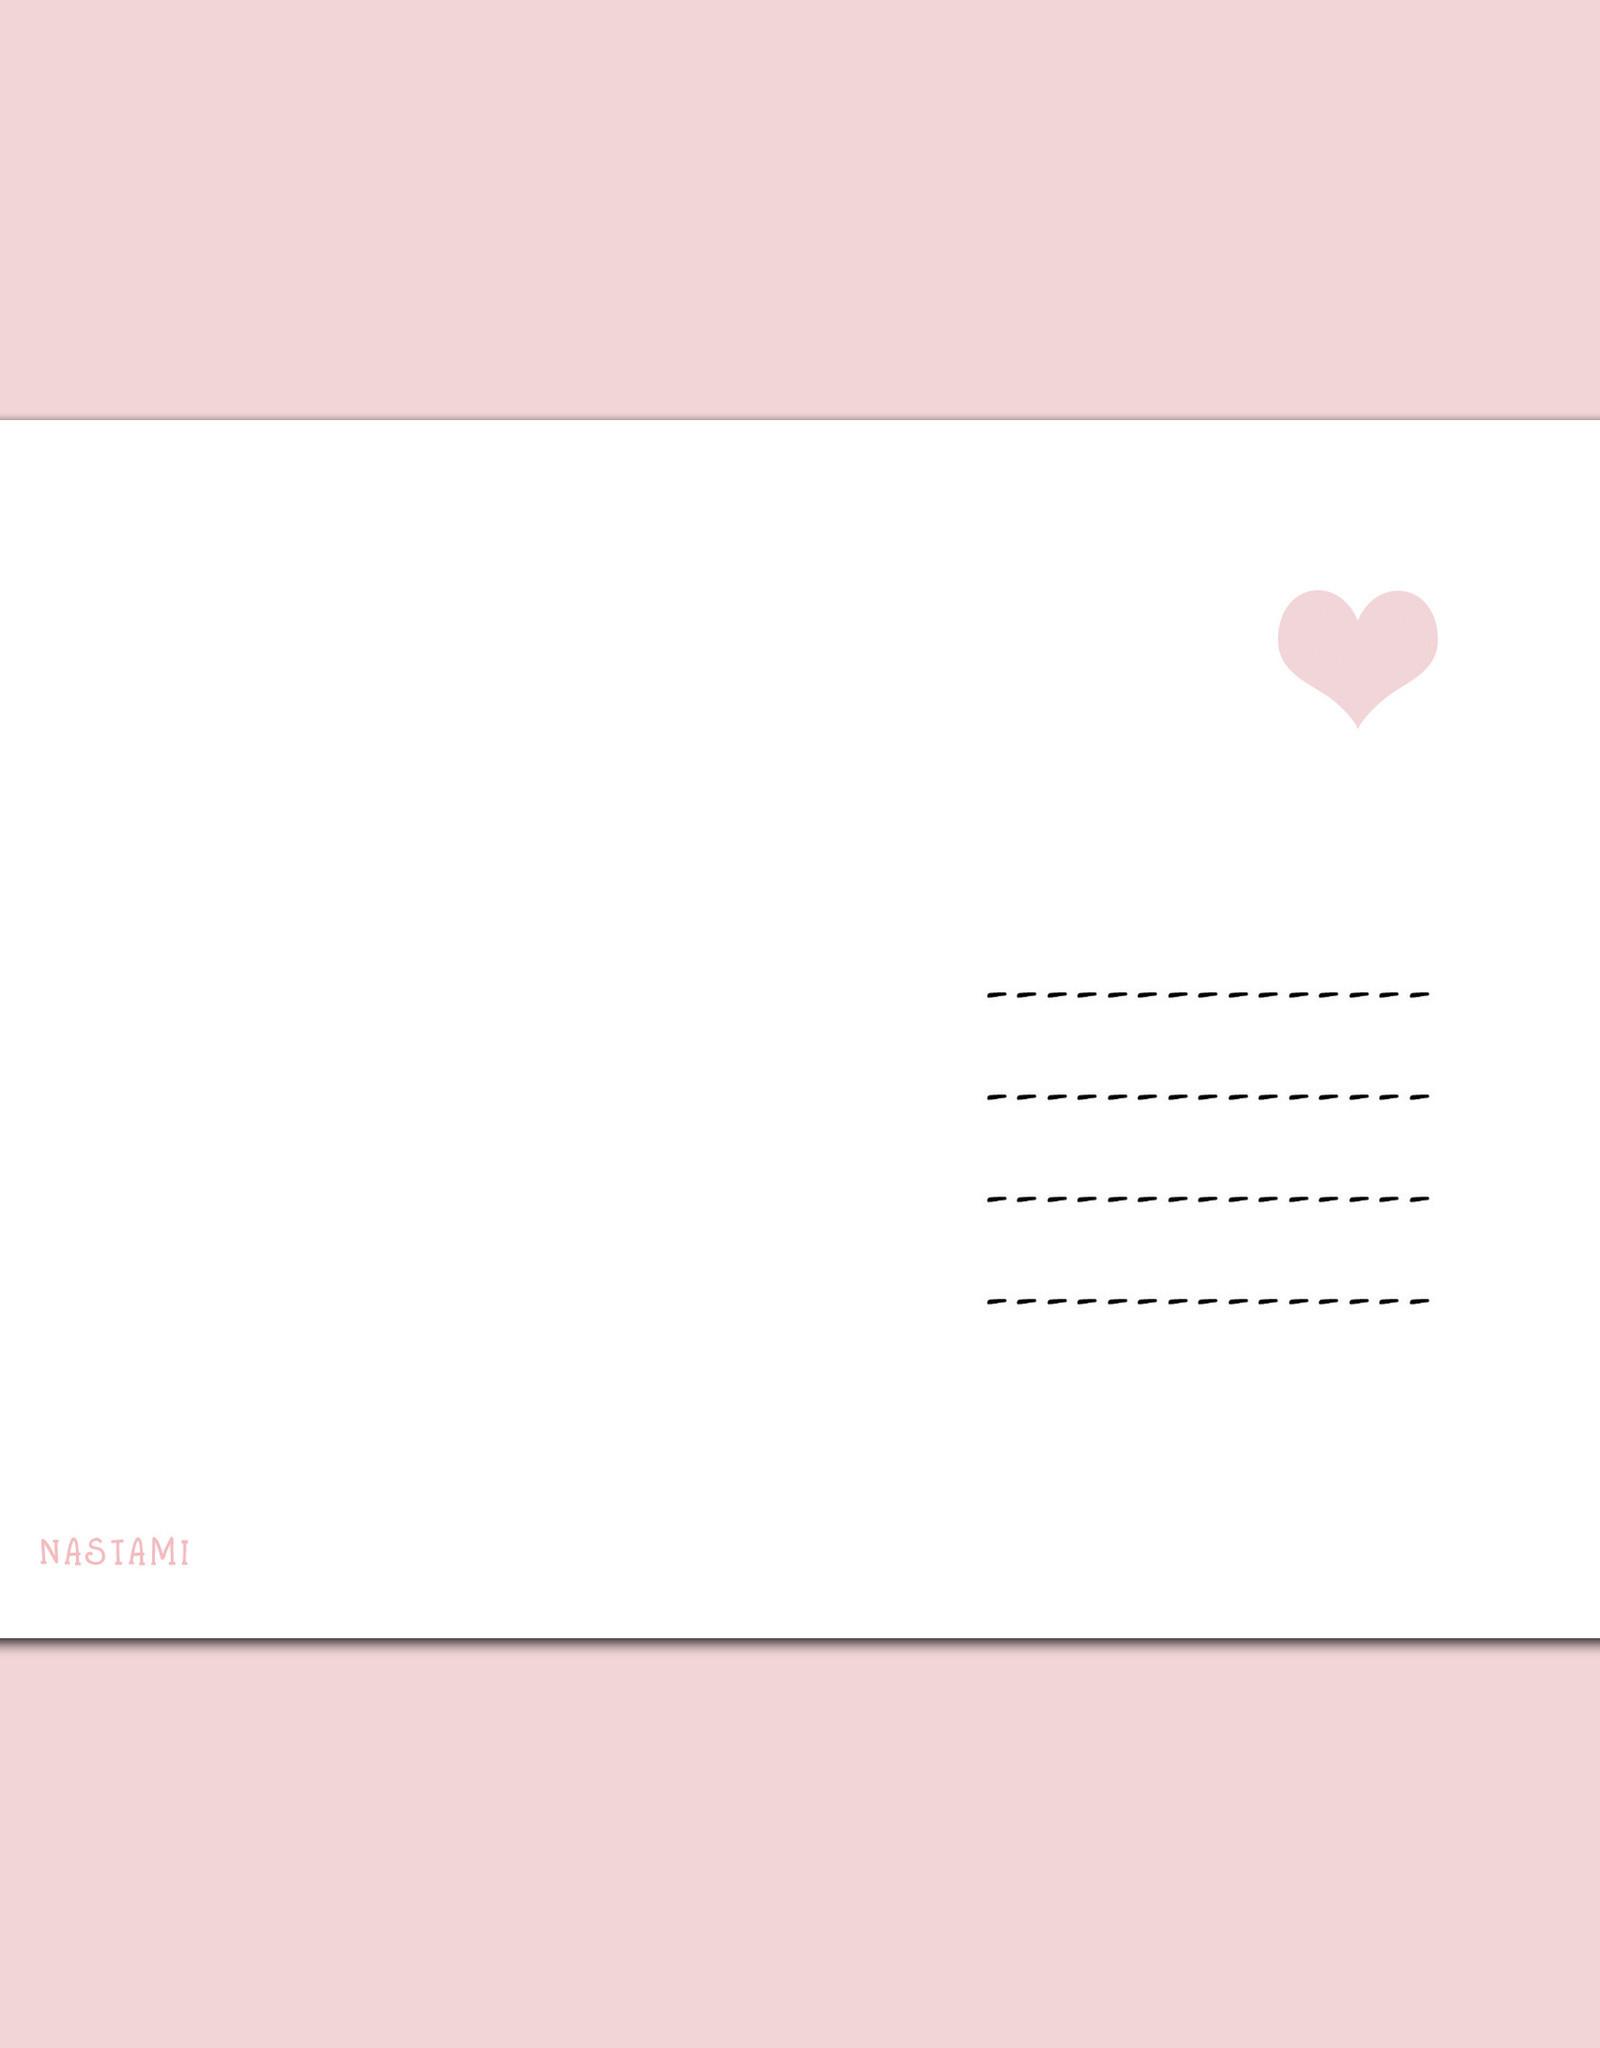 Postkarte PFLEGERIN inkl. Briefumschlag Altenpfleger Geschenk Pflegedienst Geschenk Krankenschwester Geschenk